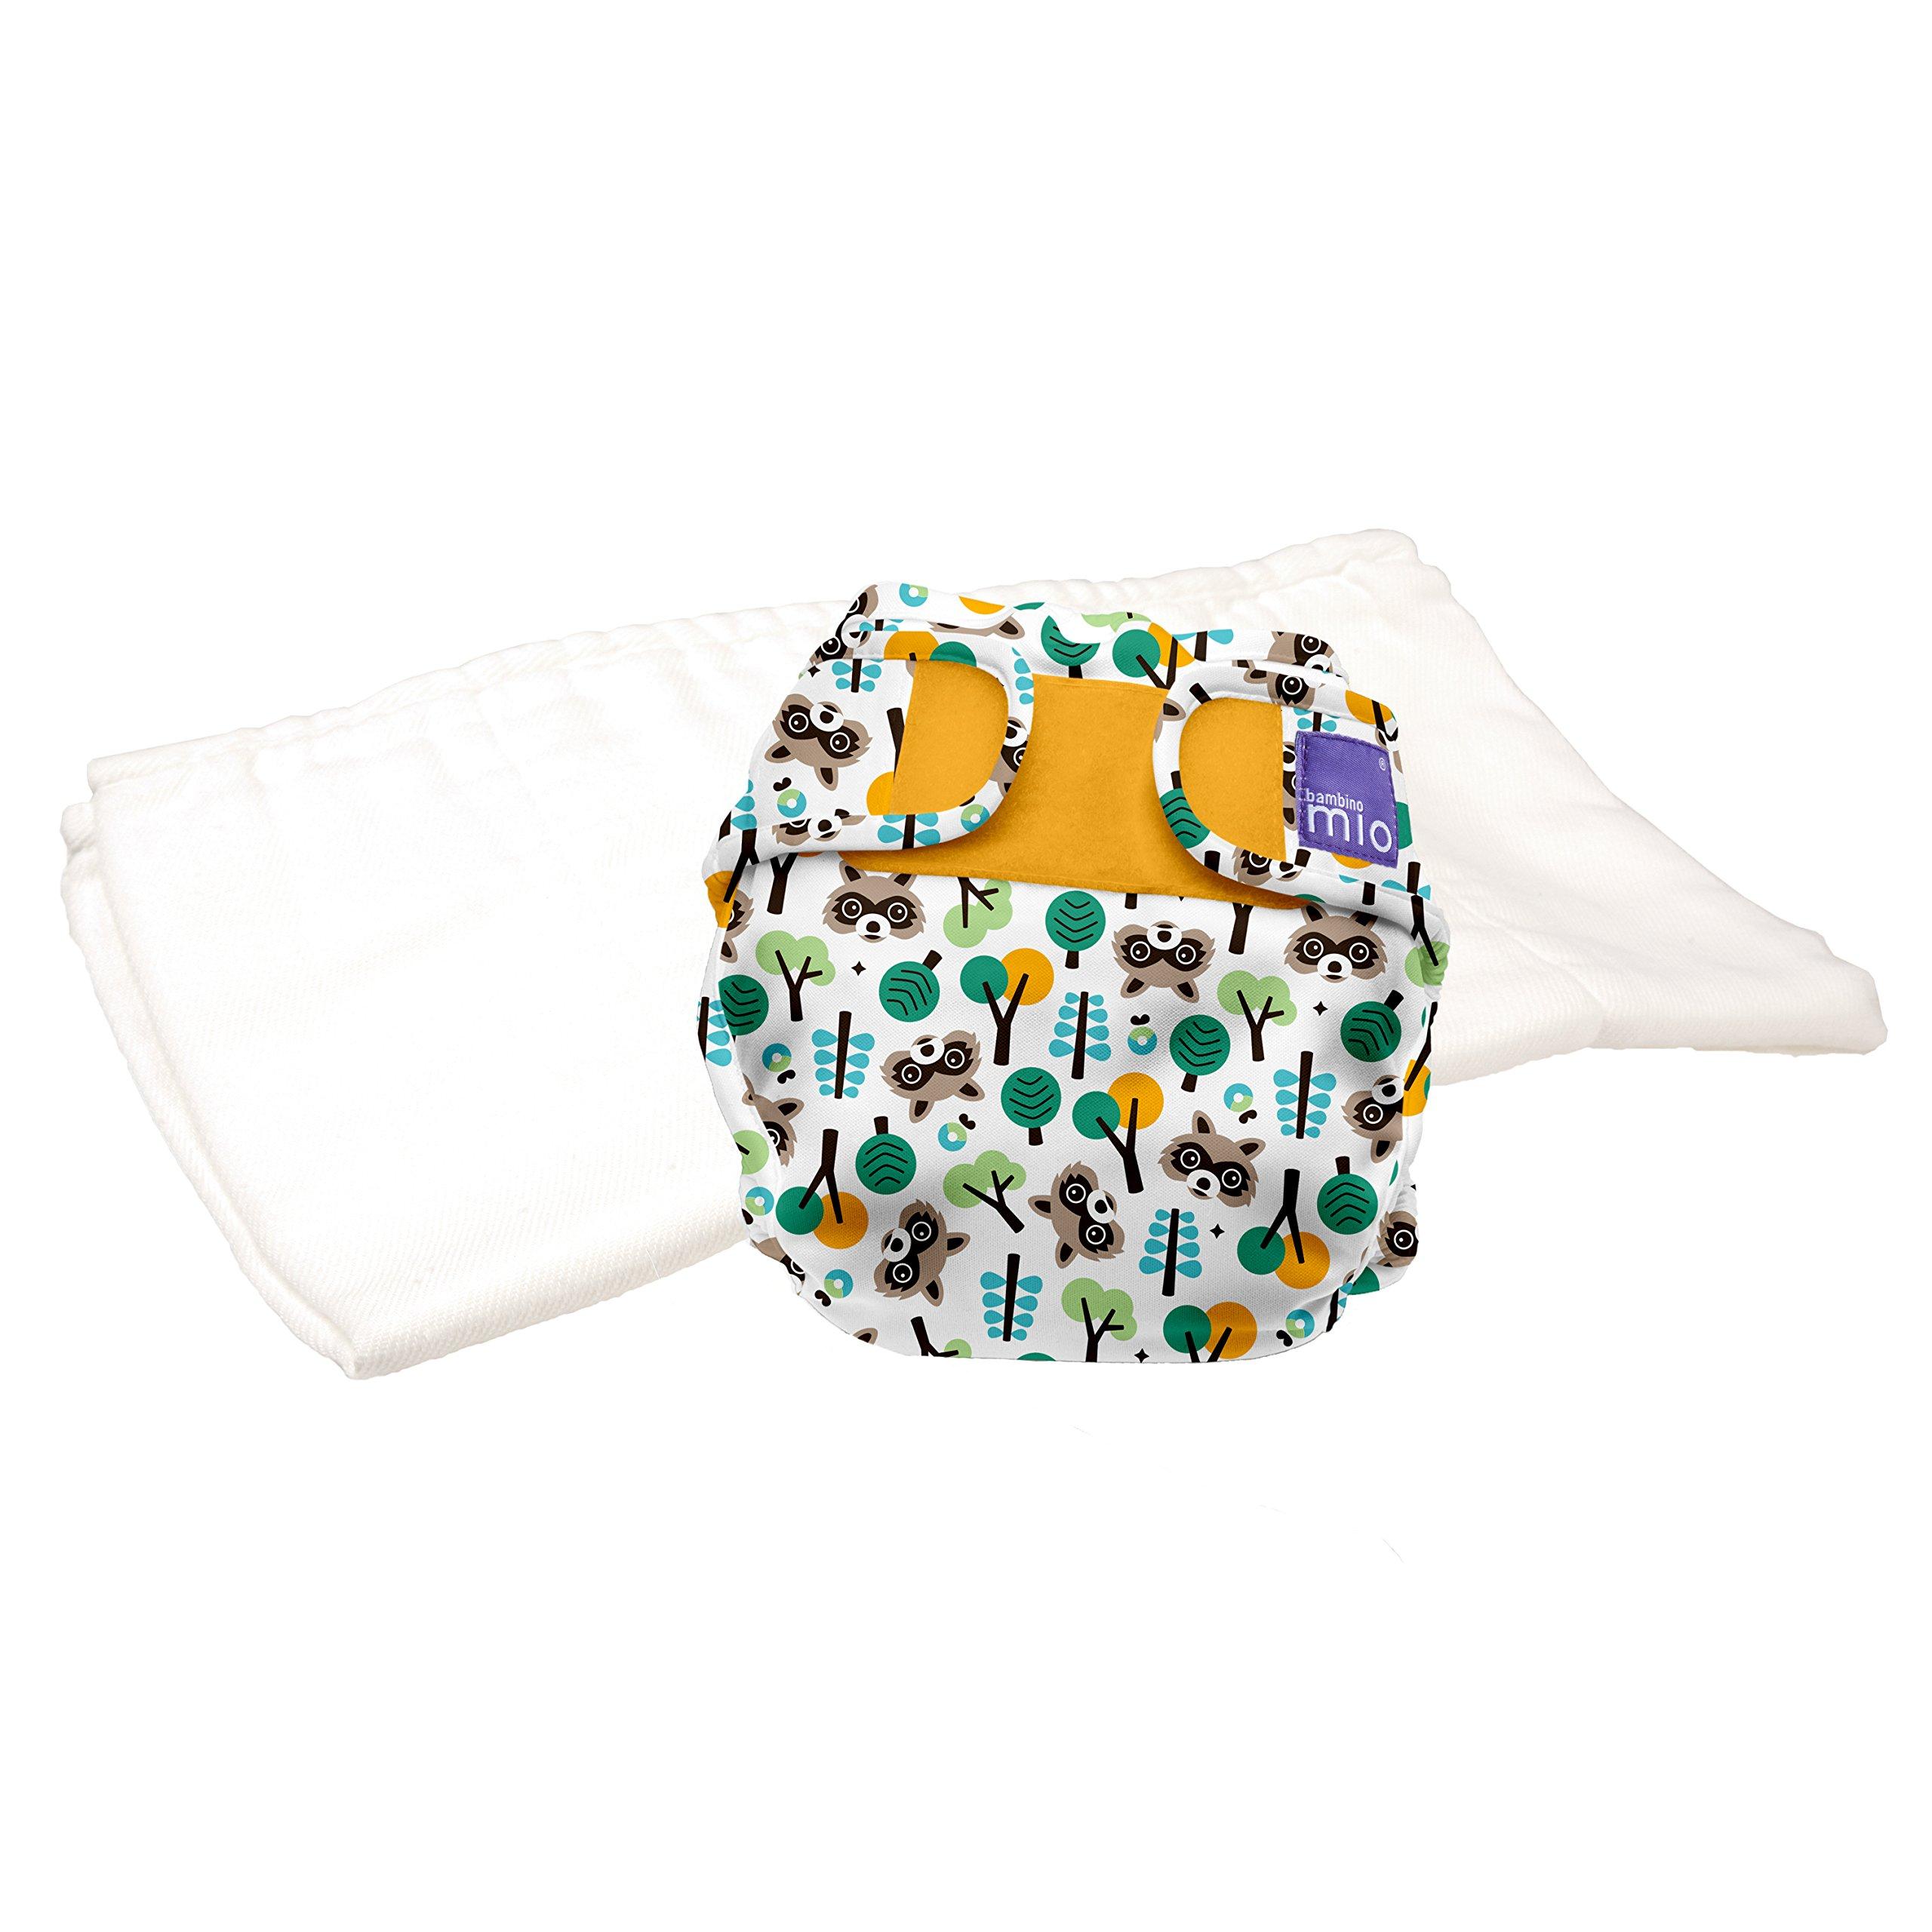 Bambino Mio, miosoft two-piece diaper (trial pack), raccoon retreat, size 2 (21lbs+)